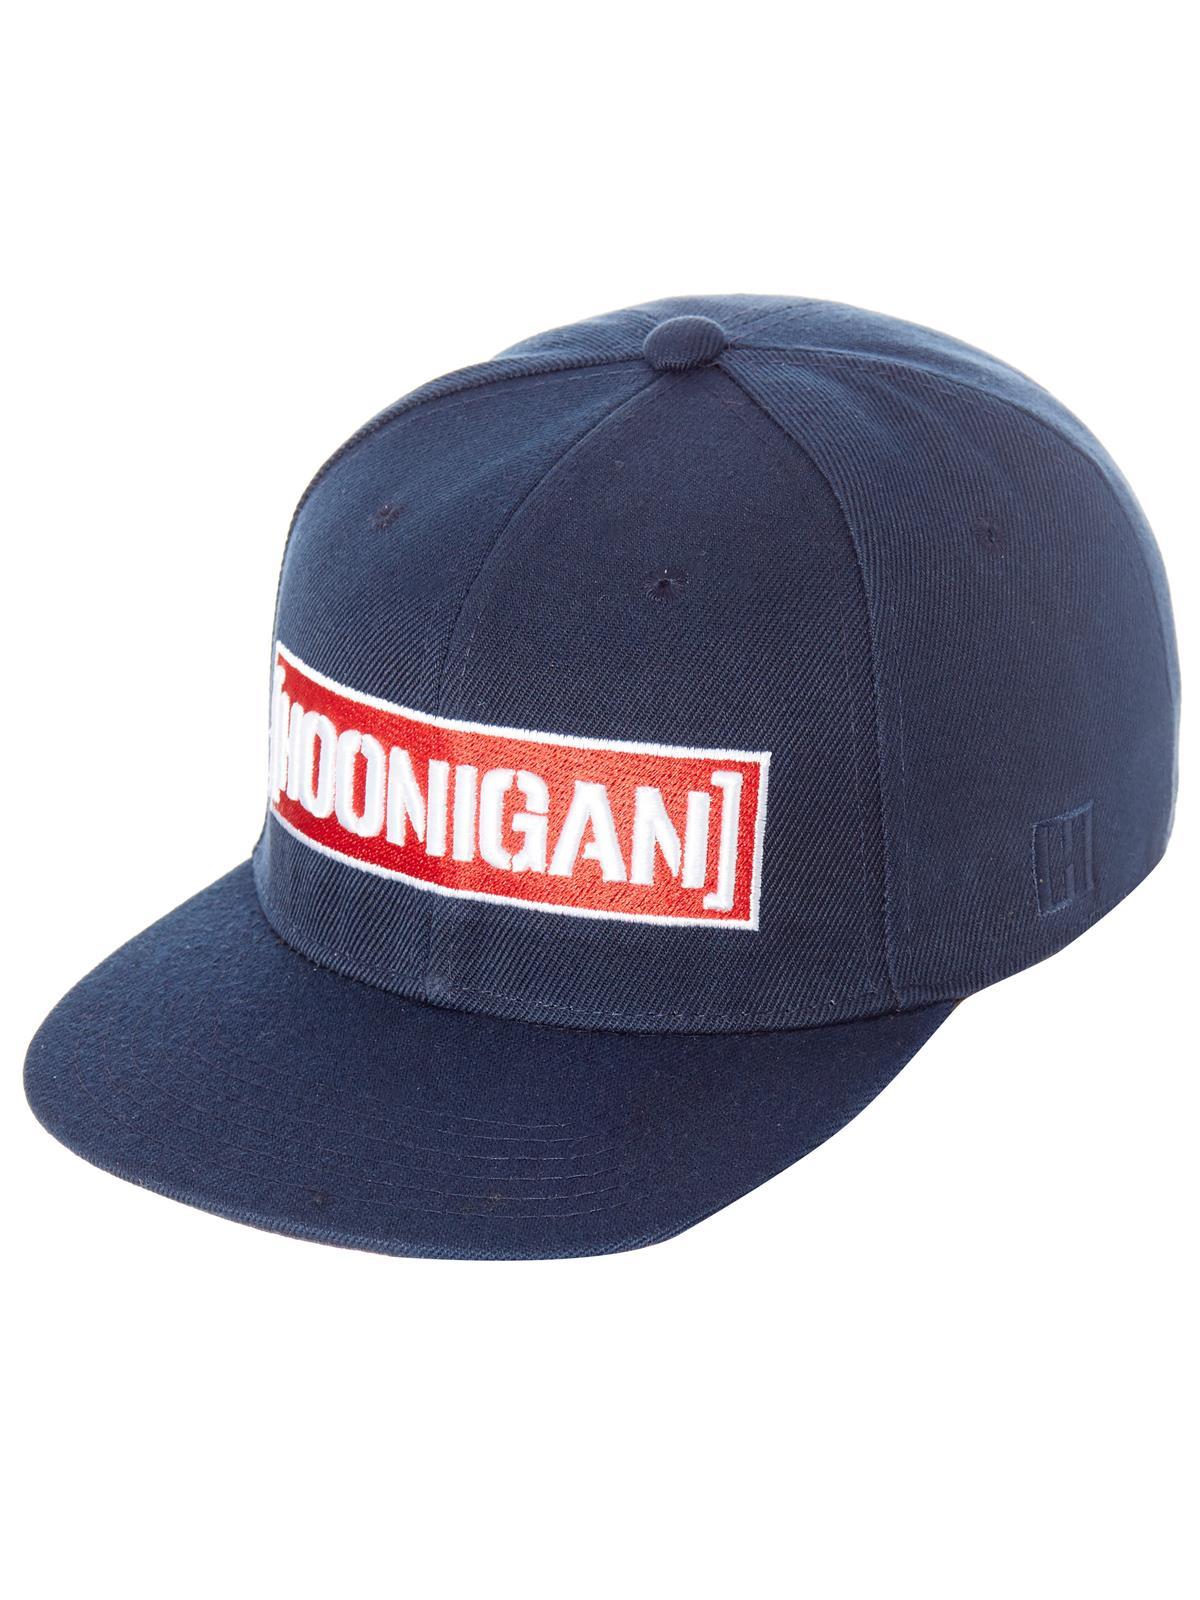 Details about Hoonigan Racing Division Ken Block Snapback Baseball Cap with  Censor Bar Logo 33eb072379e